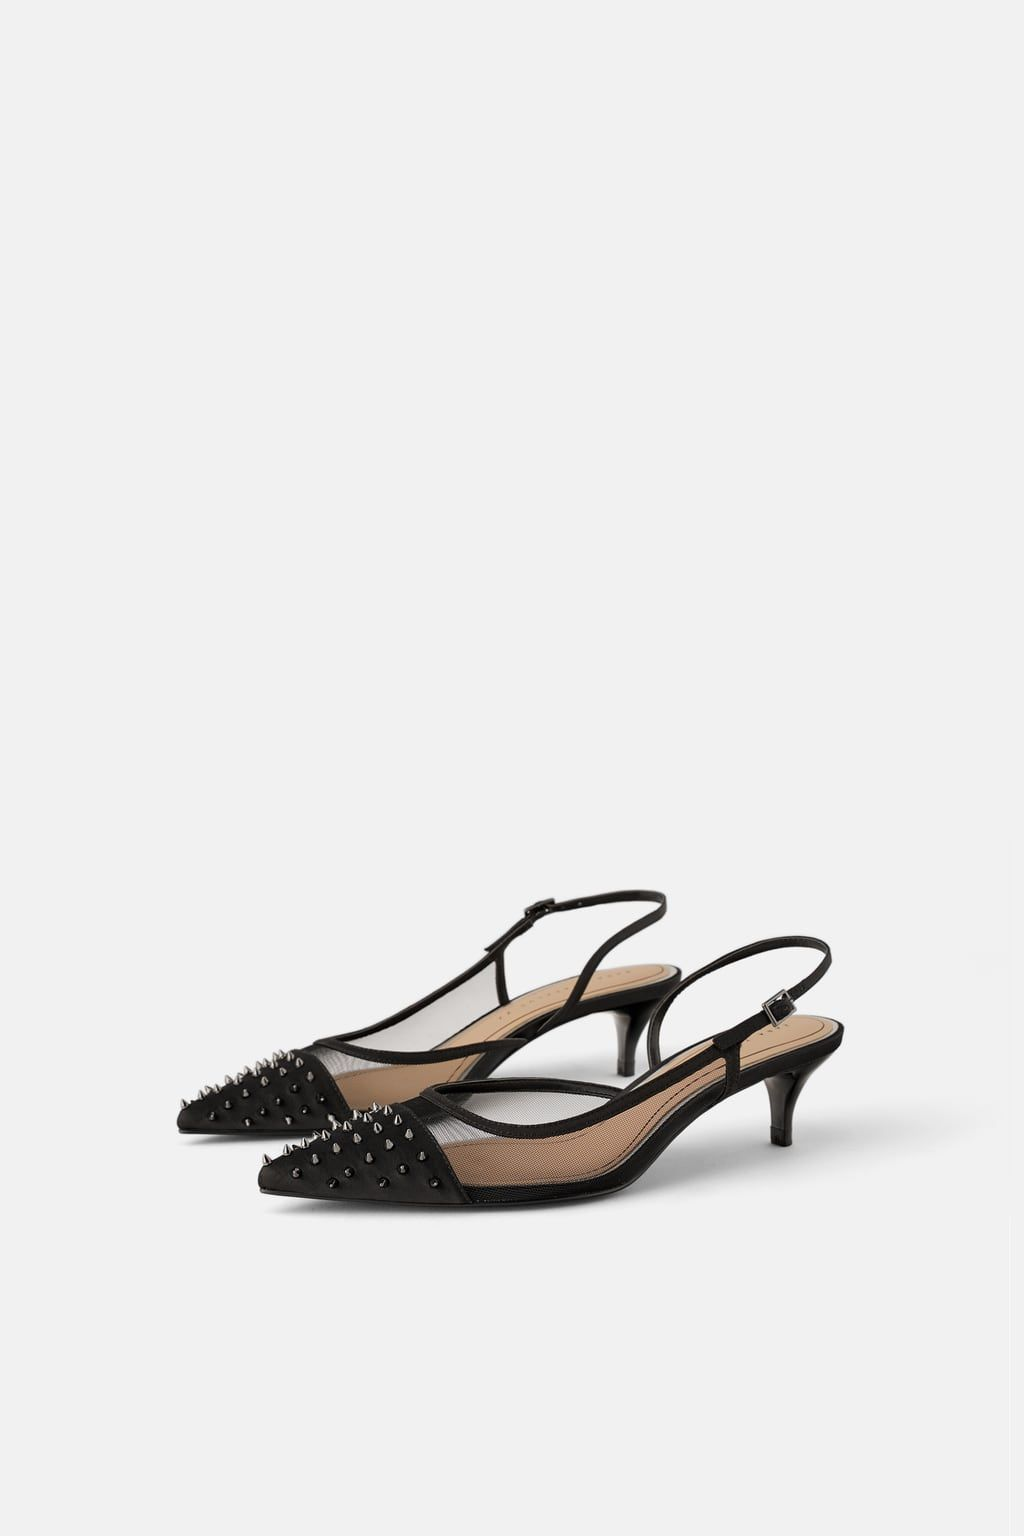 Studded Mesh Slingback Heels Shoes Trf Zara United States Heels Slingback Heel Black Slingback Heels